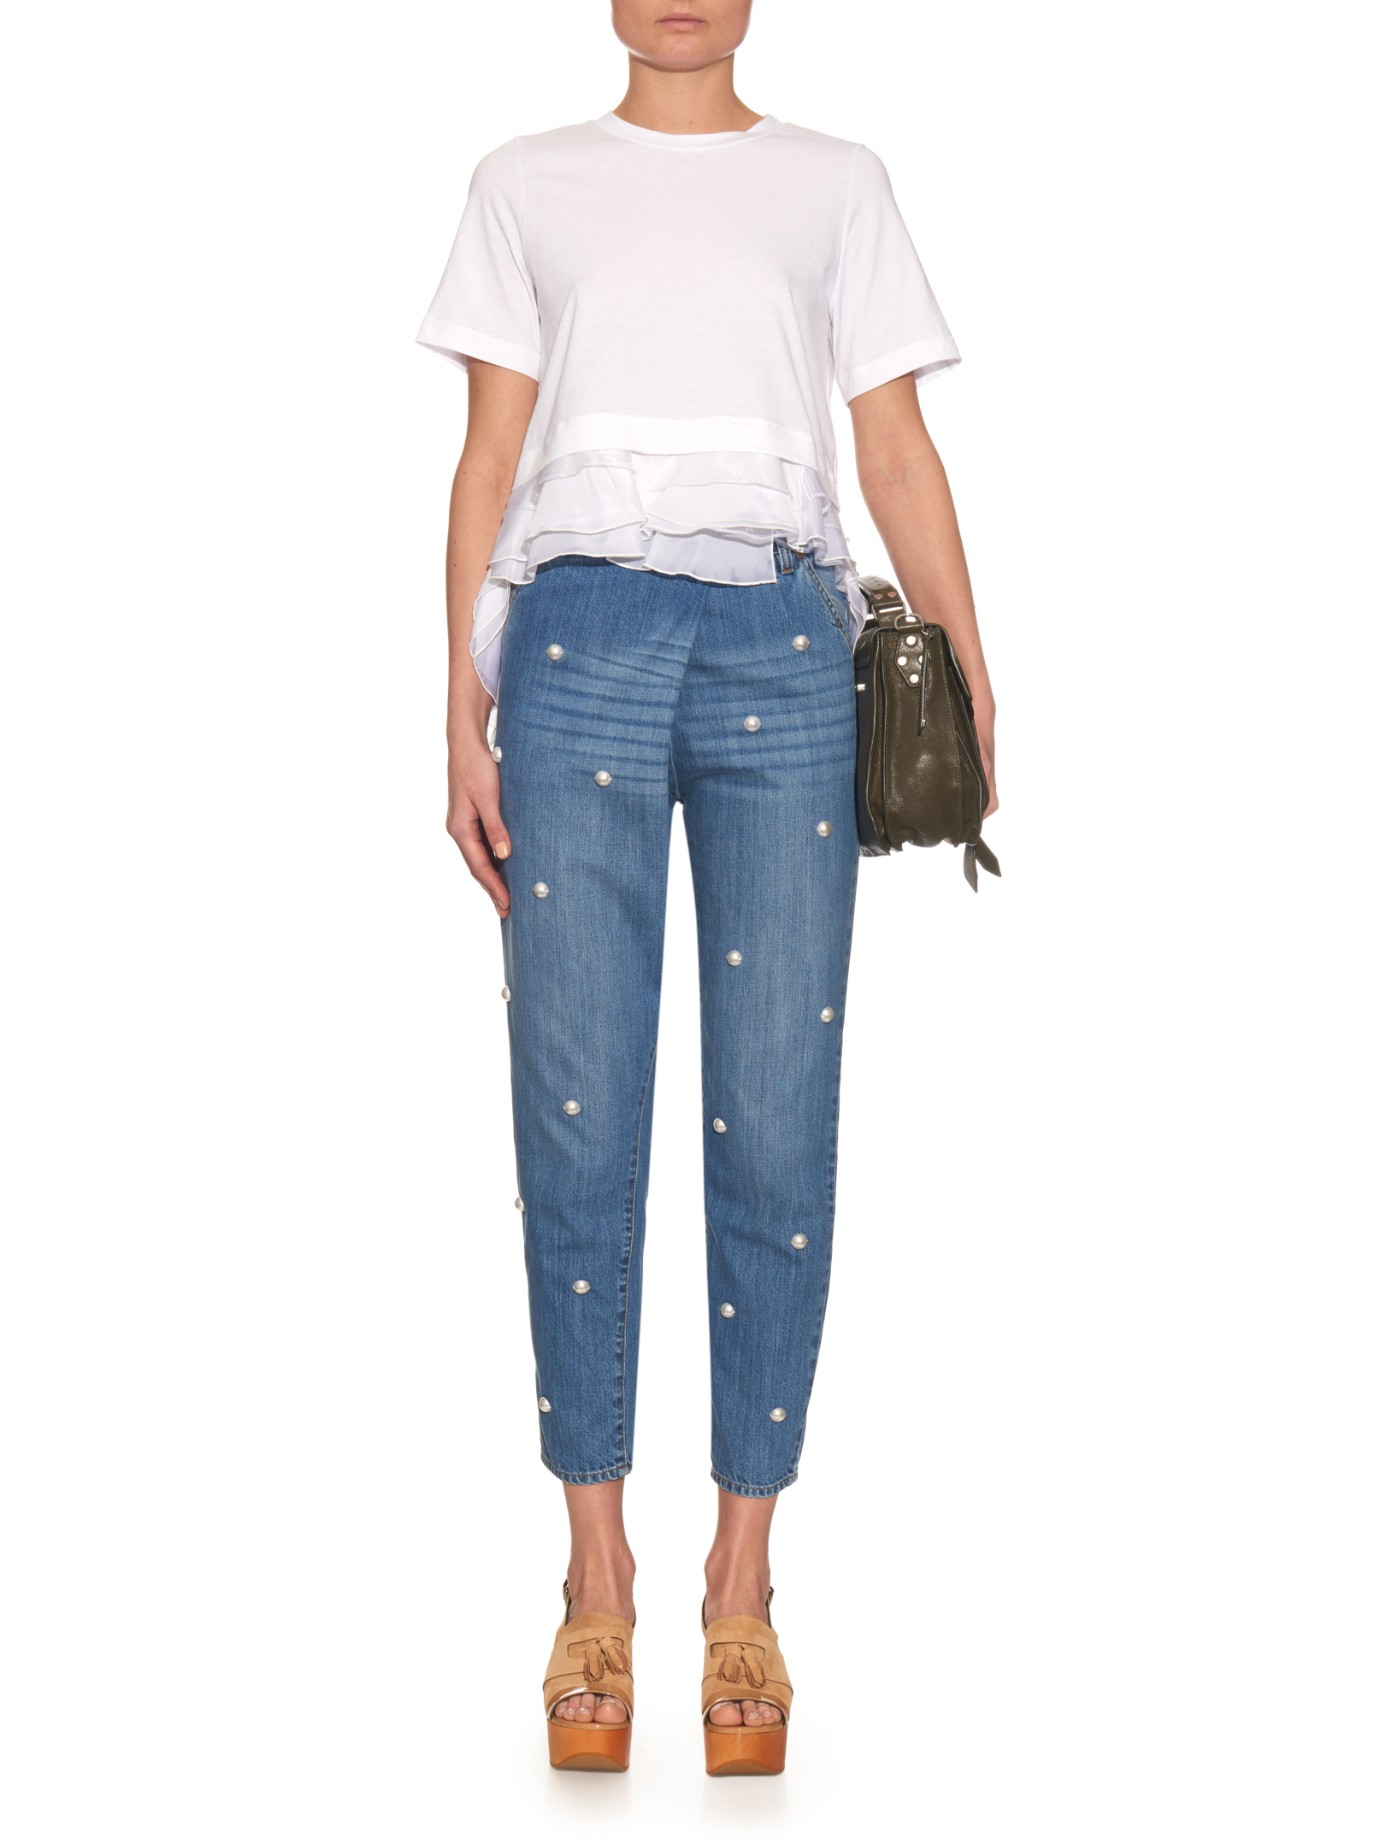 Comme des Garçons Ruffled Shirt in White for Men - Lyst |Ruffle Shirt